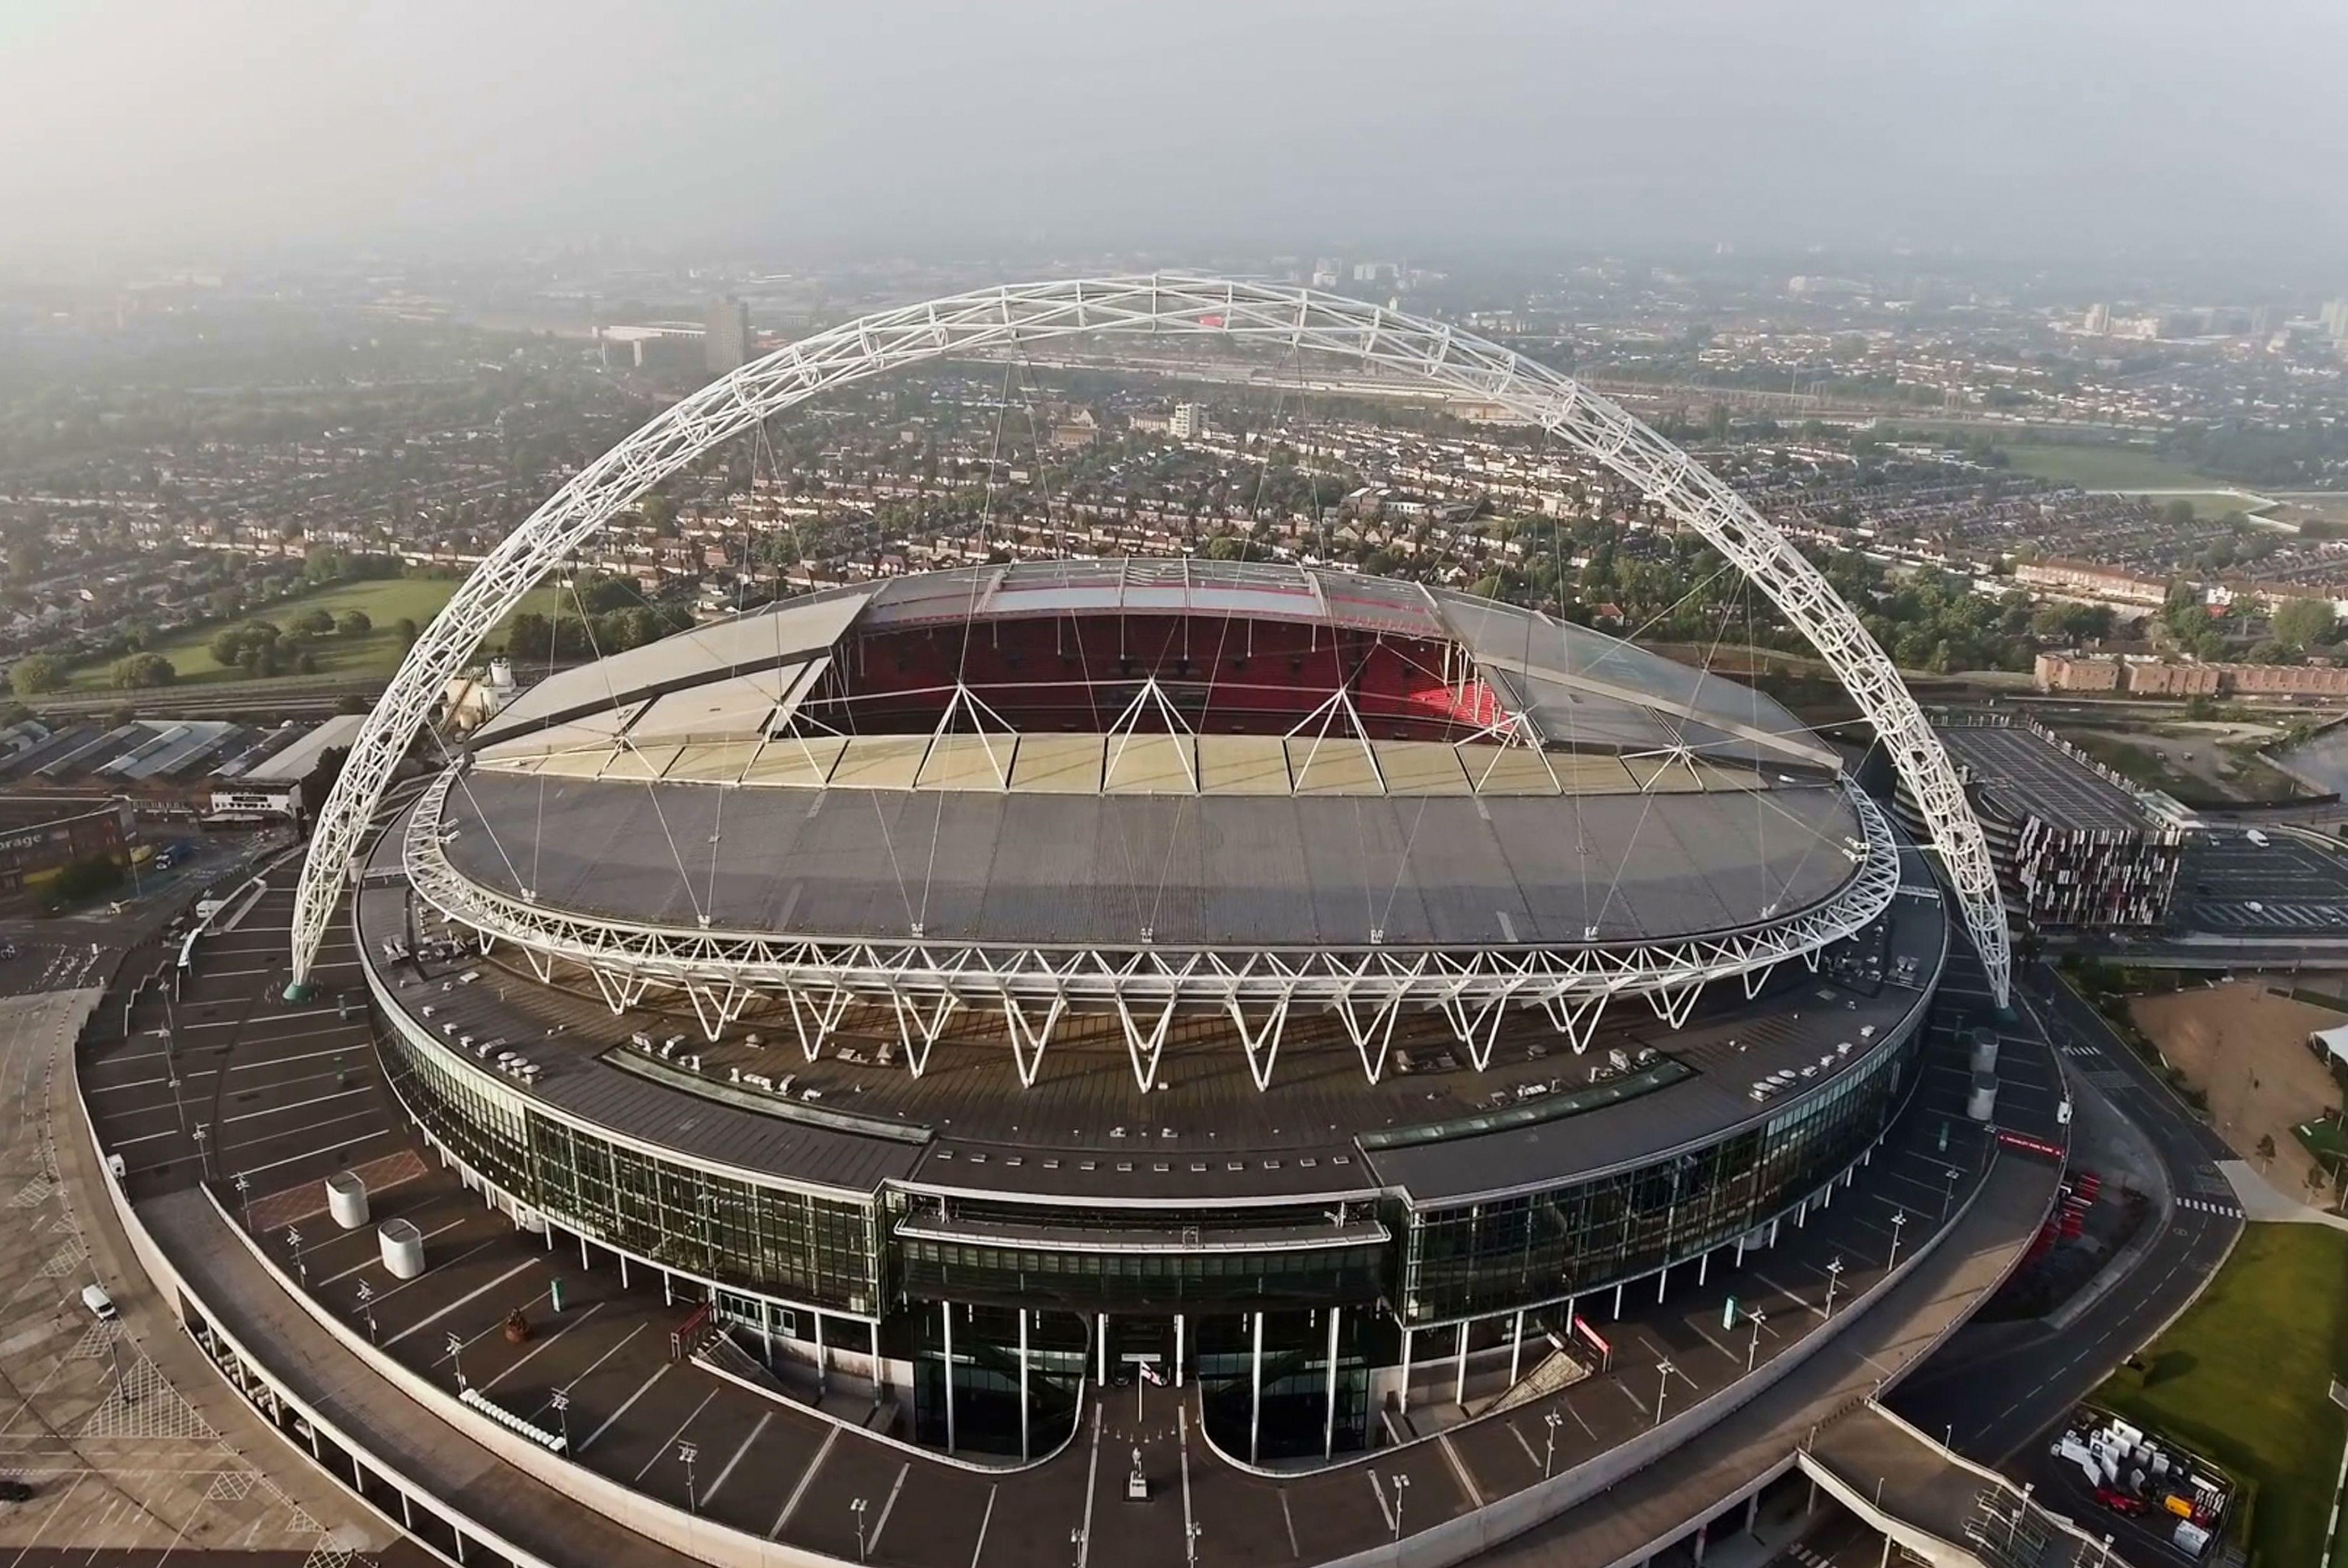 Pregame Tailgate at Wembley Stadium